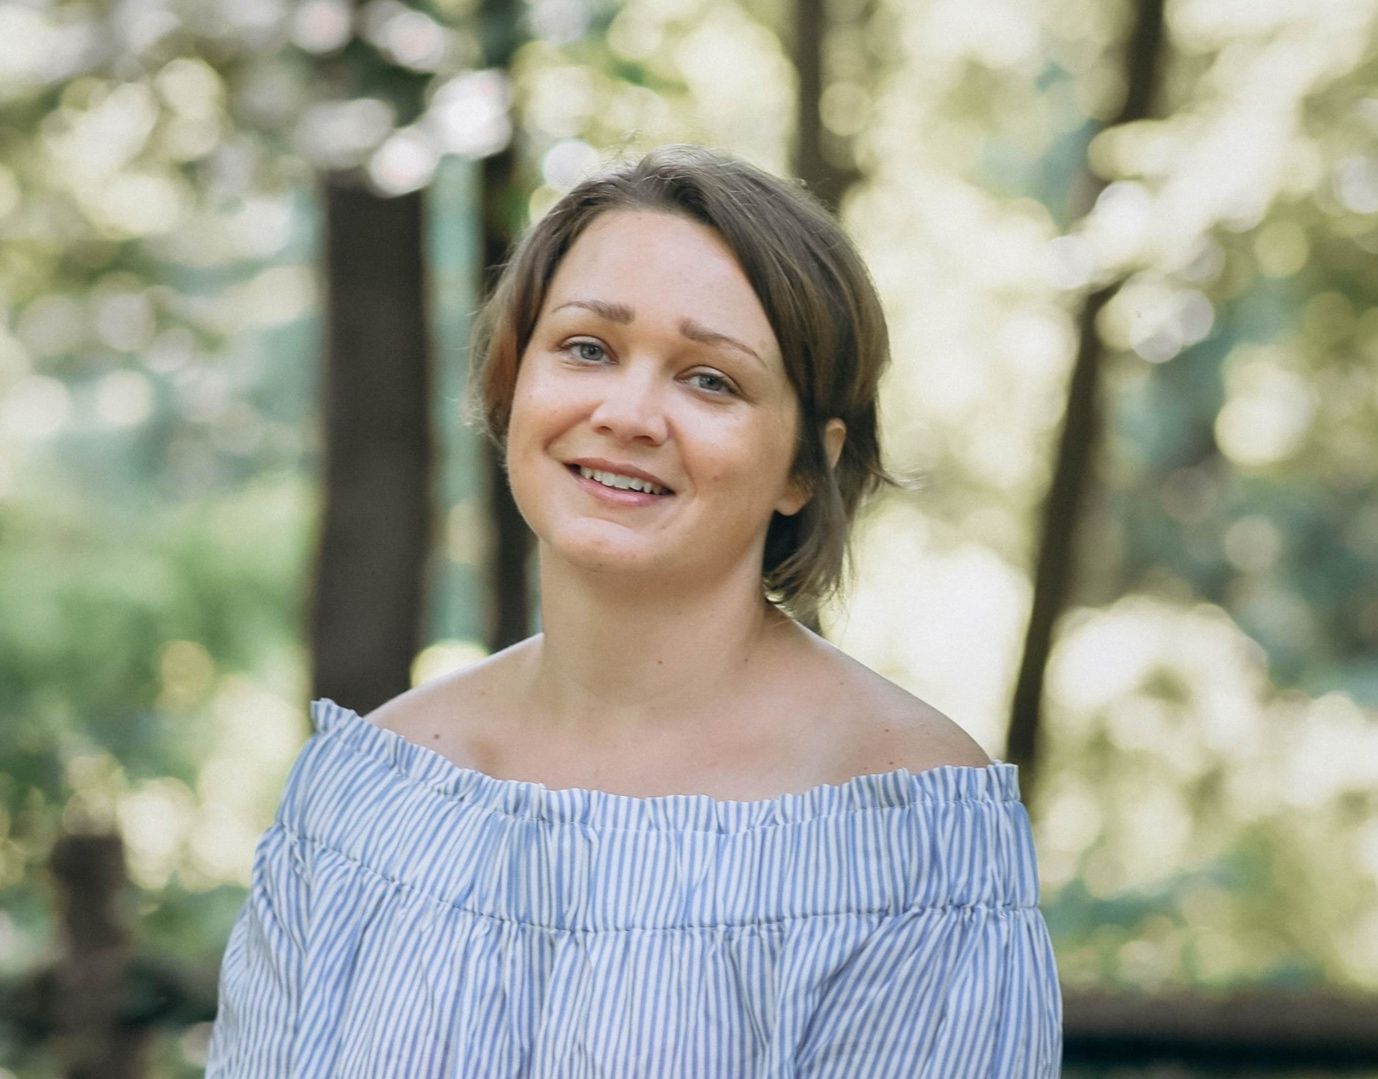 Megan Moody (Photo Credit: Faces of Postpartum)